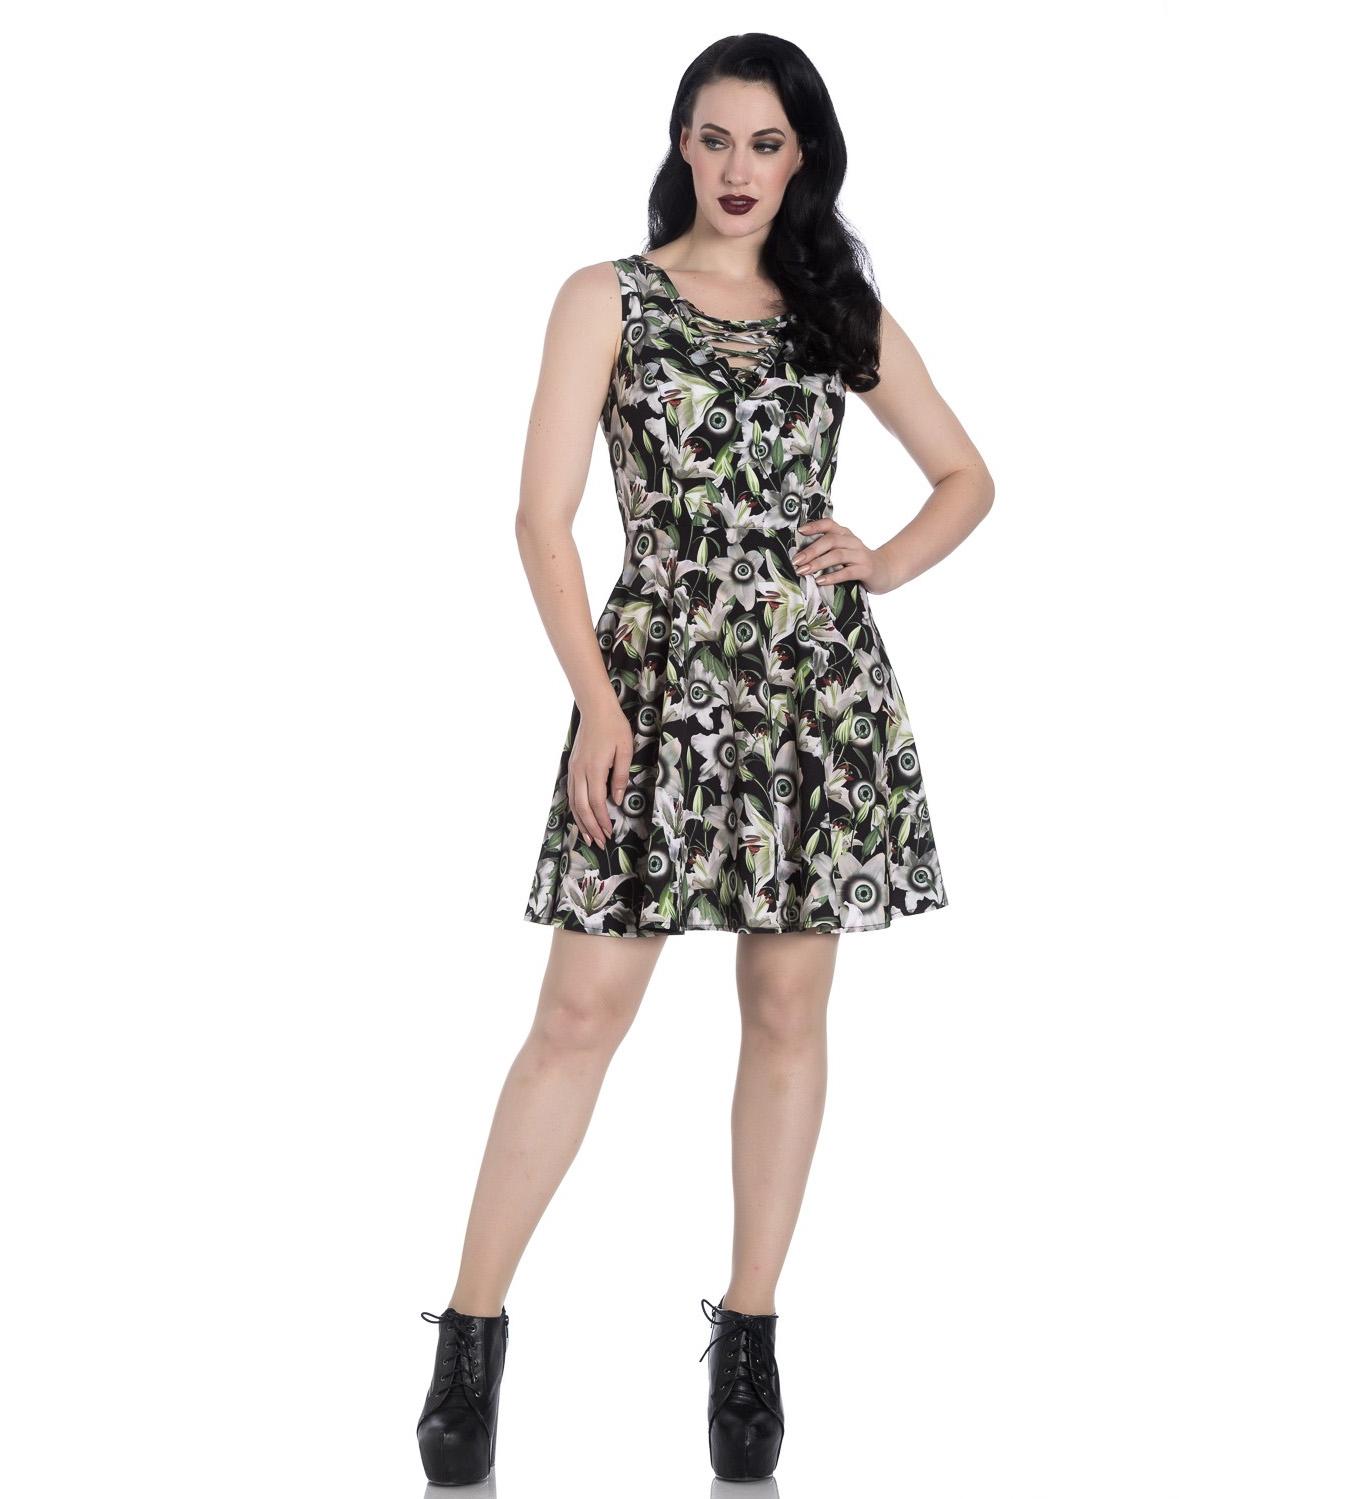 Hell-Bunny-Black-Lace-Up-Goth-Punk-Mini-Dress-PEEPERS-Eyeballs-Flowers-All-Sizes thumbnail 45